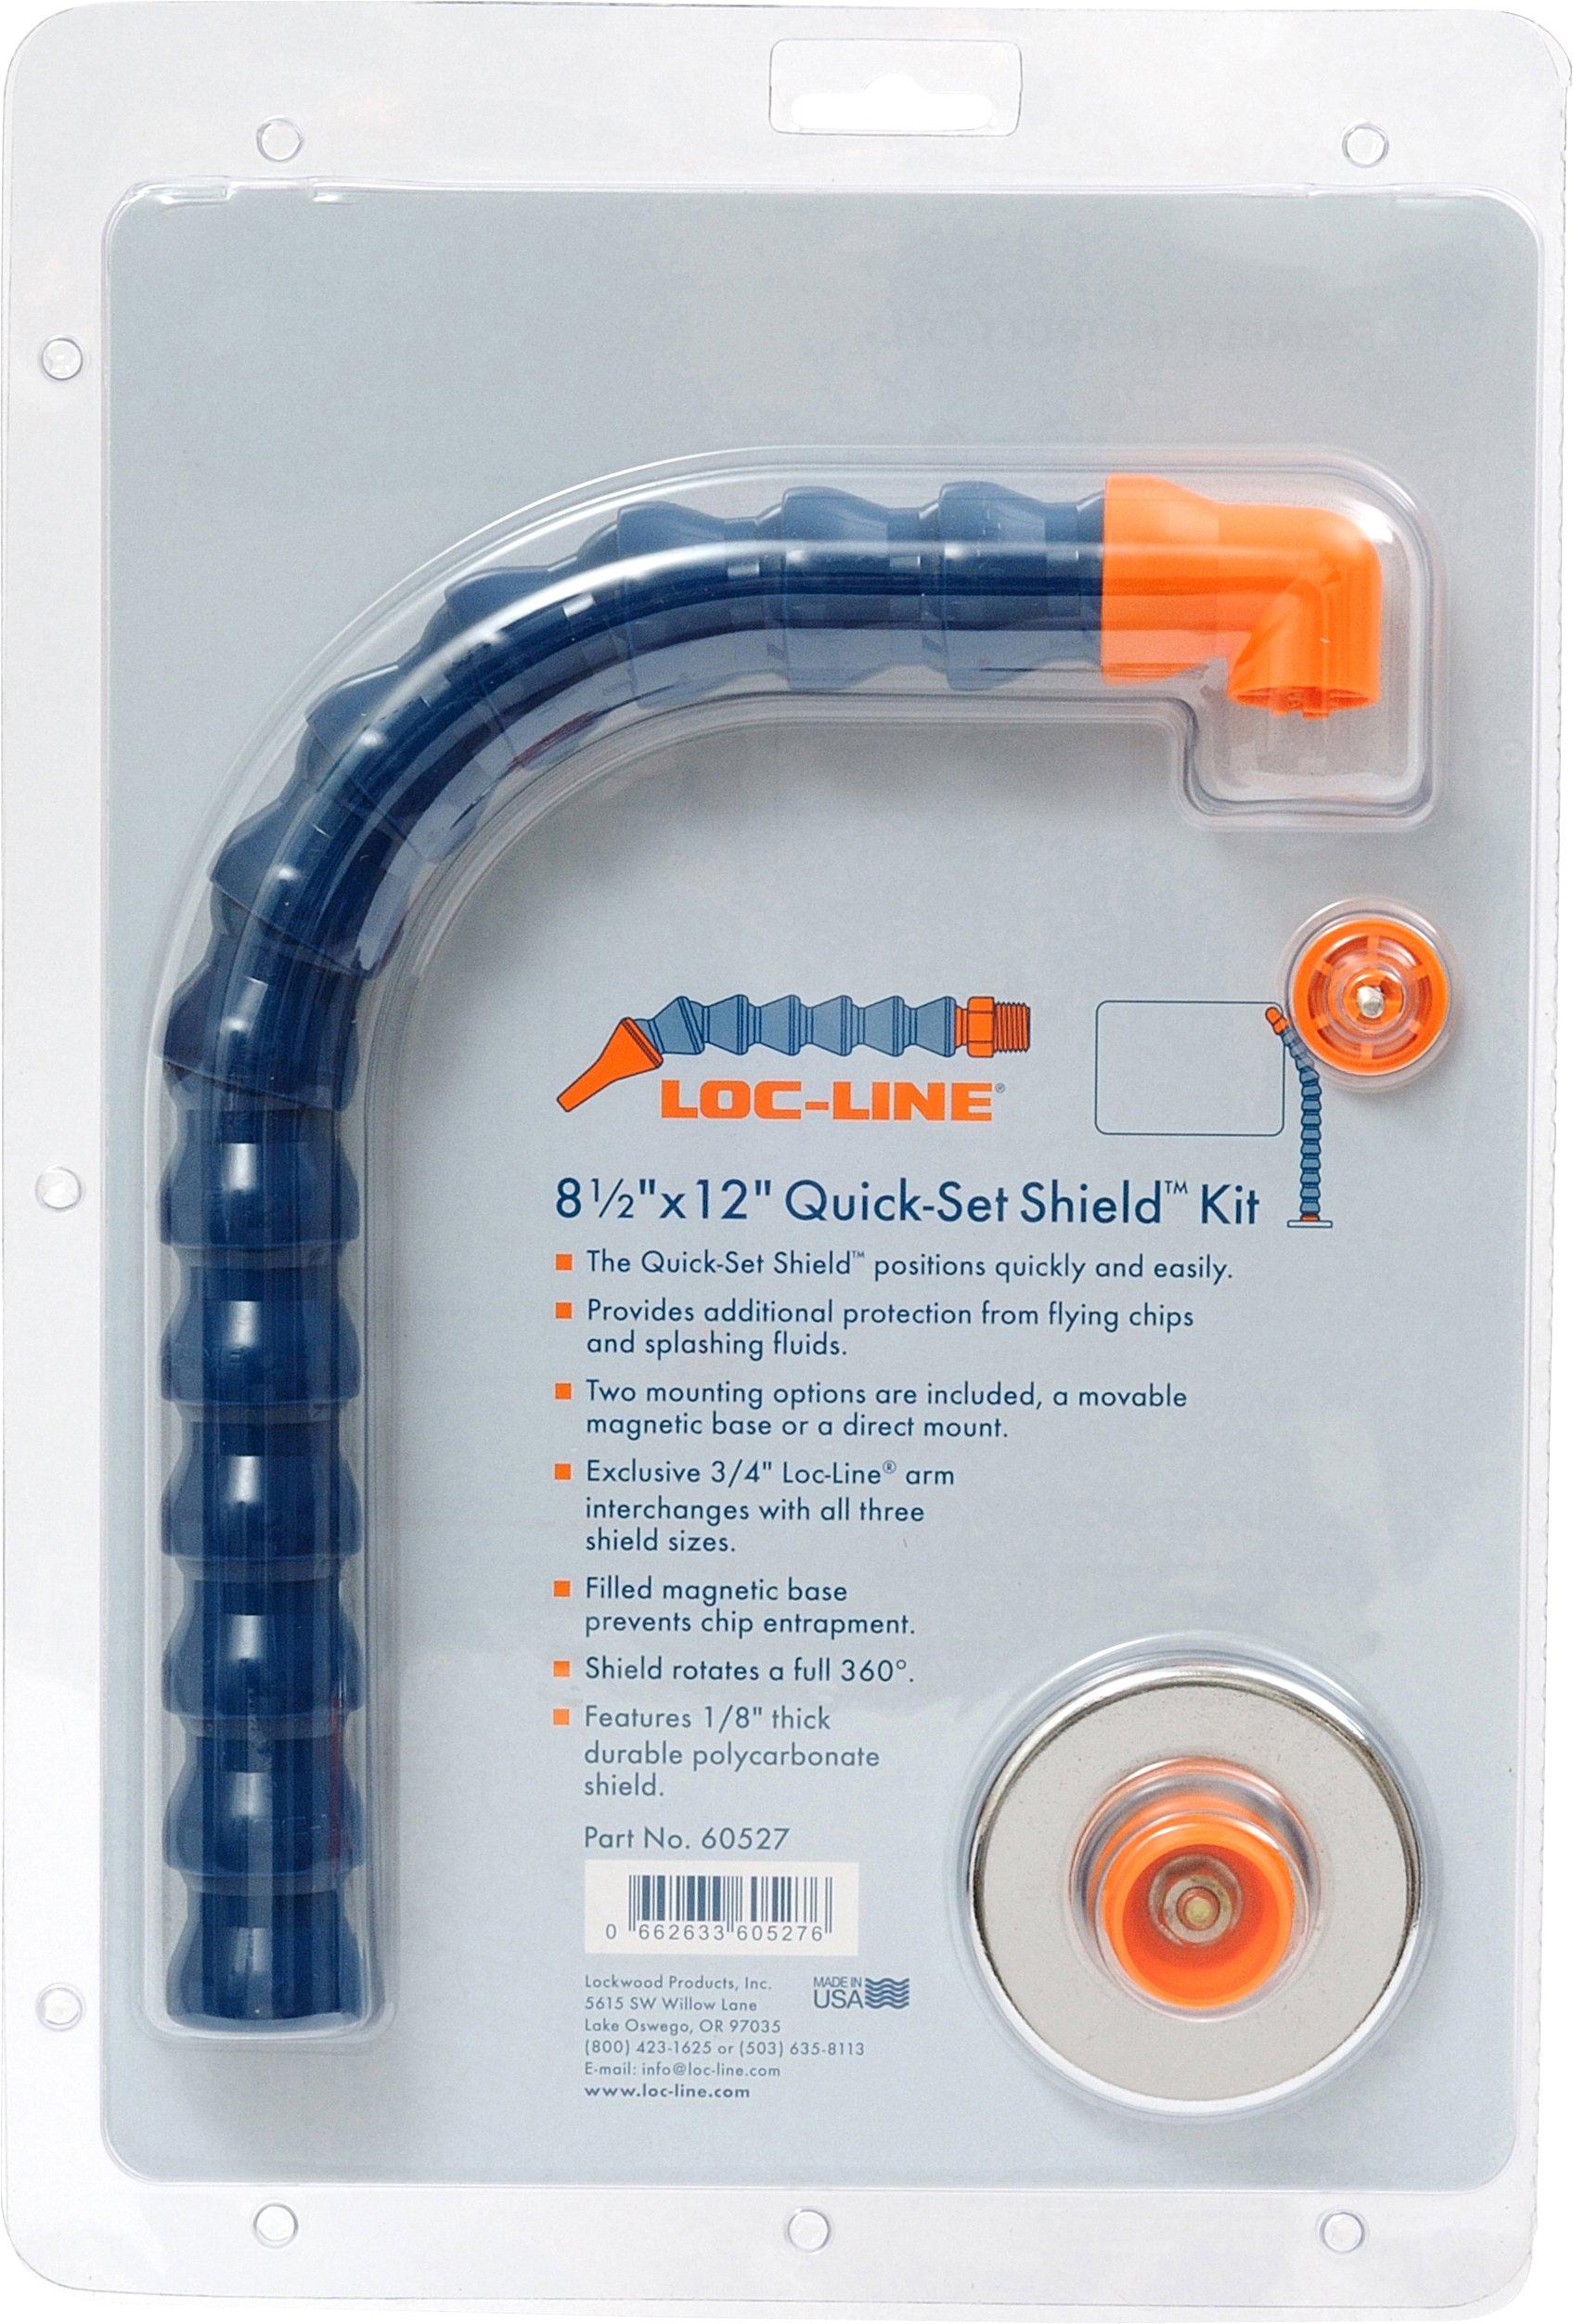 Loc-Line Coolant Hose Accessory, 8-1/2'' x 12'' Quick-Set Large Shield Kit, 3/4'' Hose ID